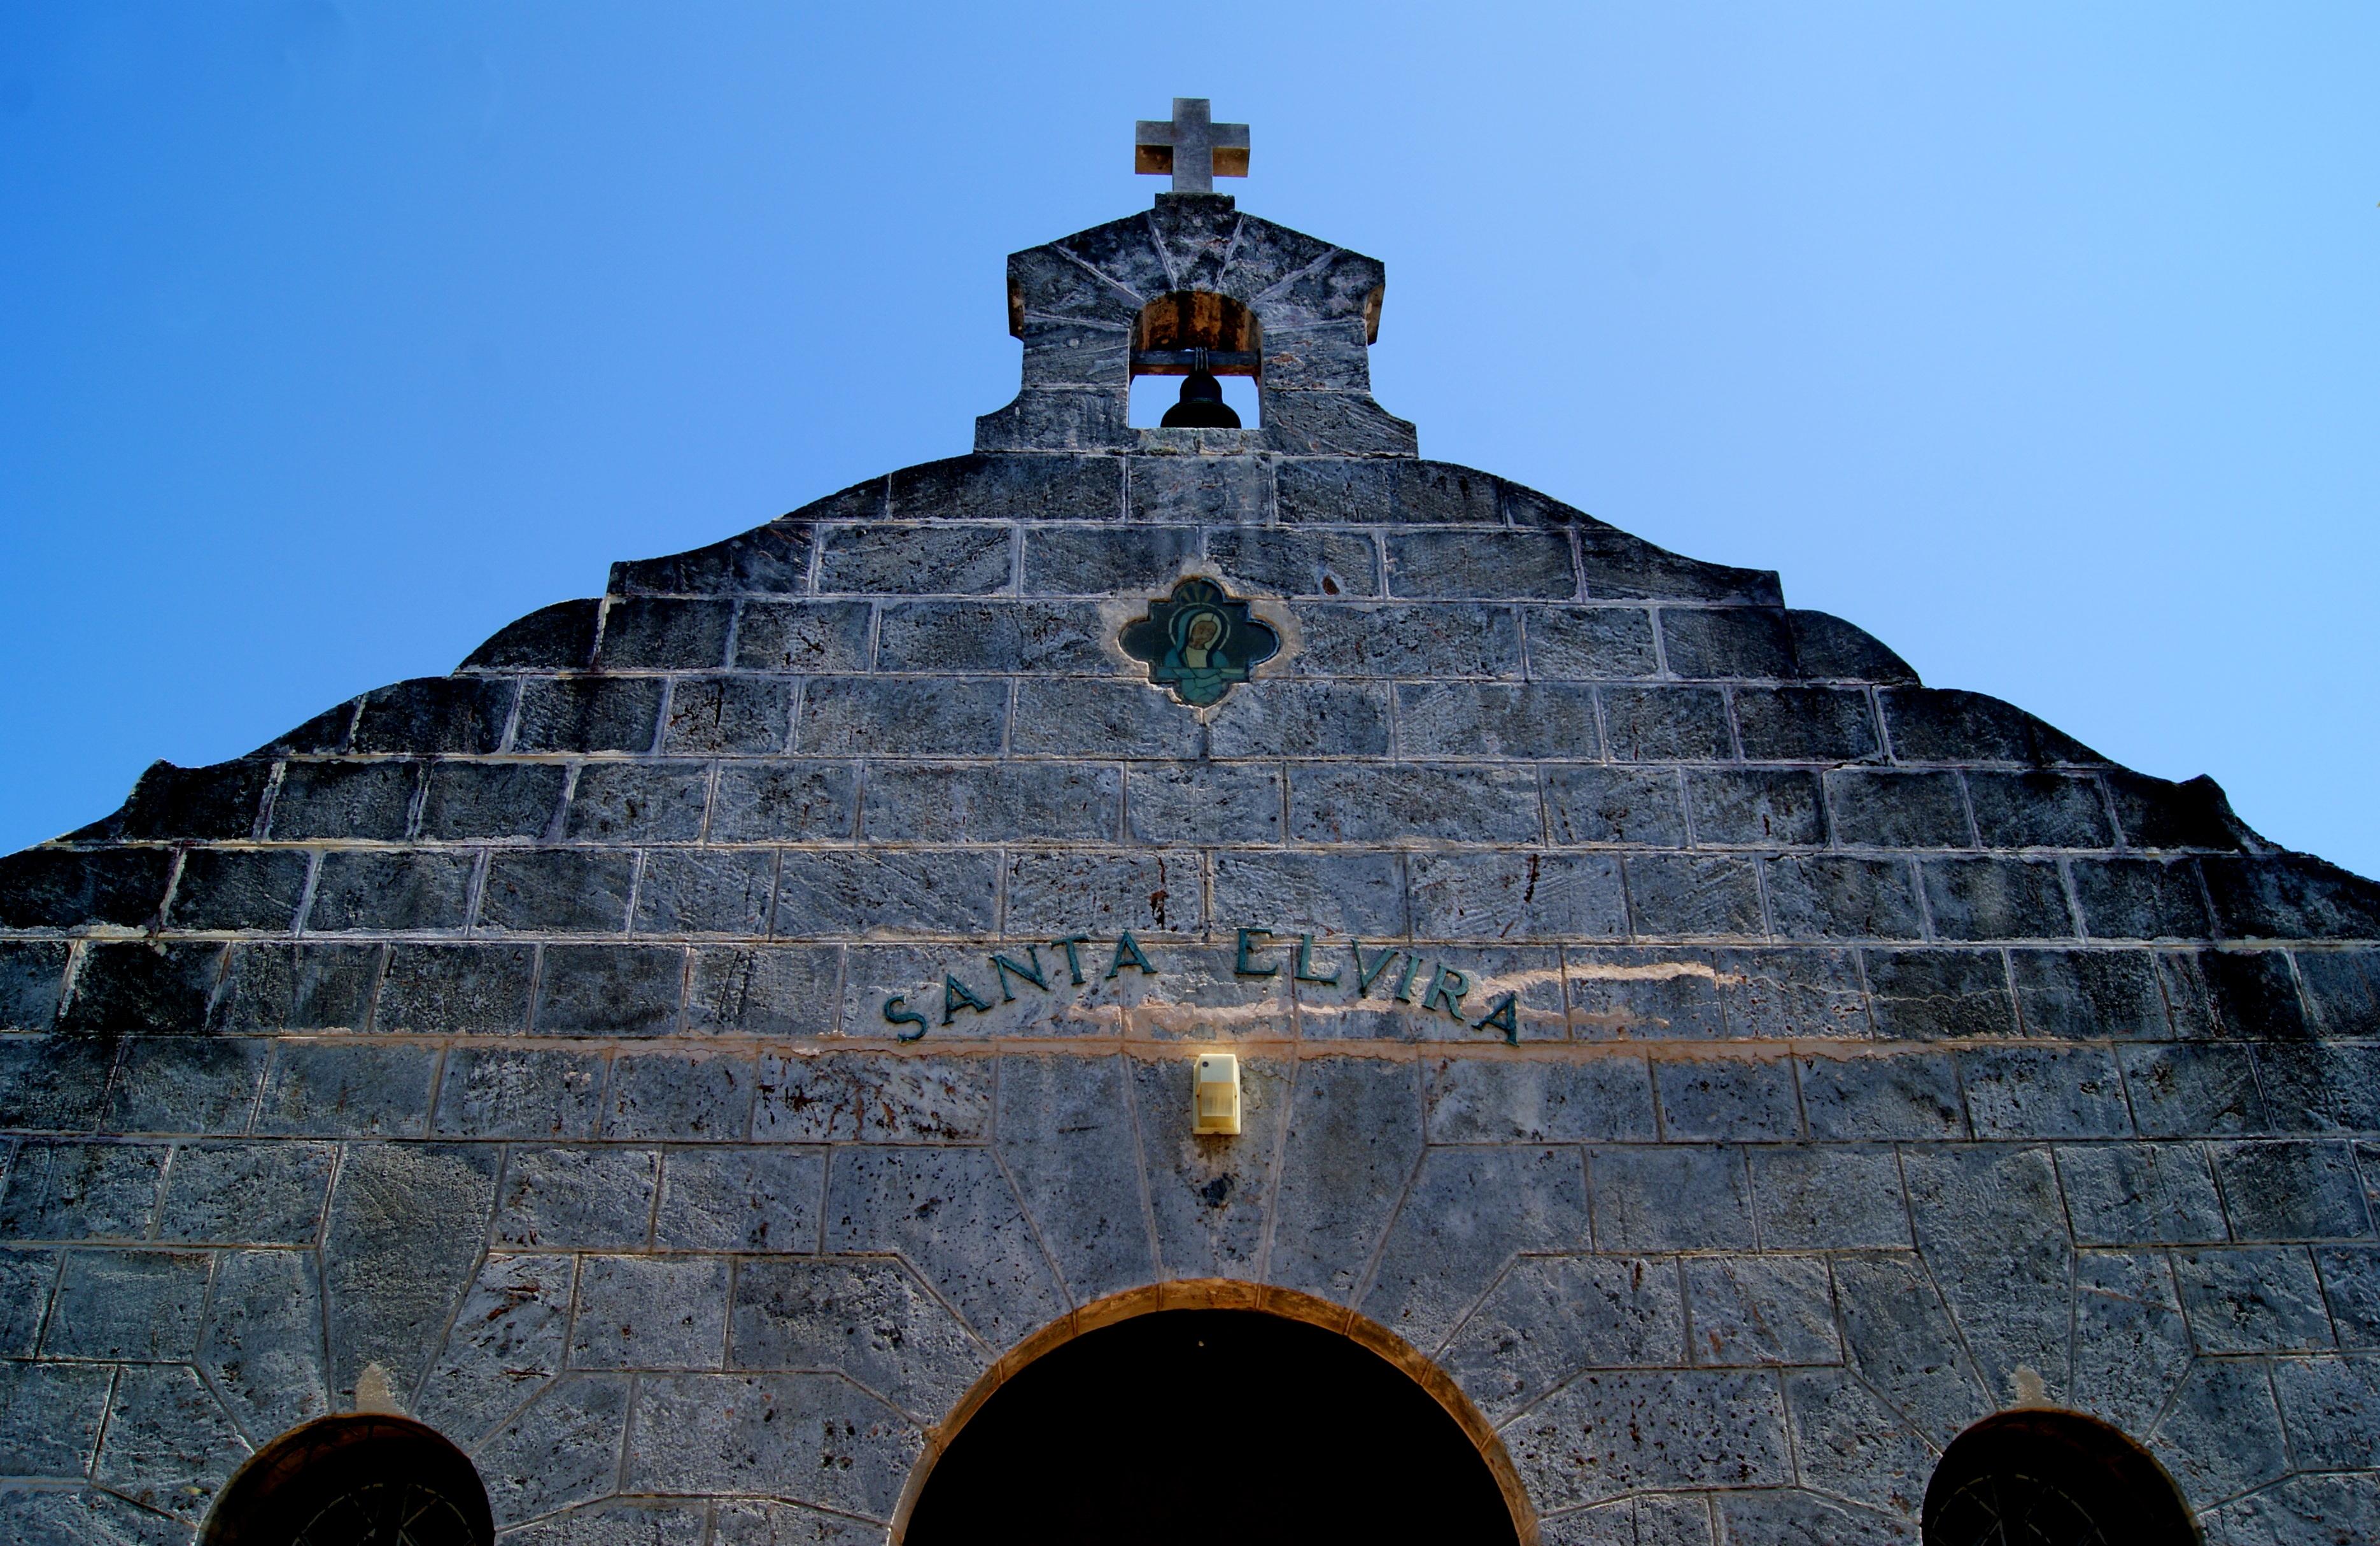 église cuba, cuba varadero, église à varadero, édifices religieux cuba